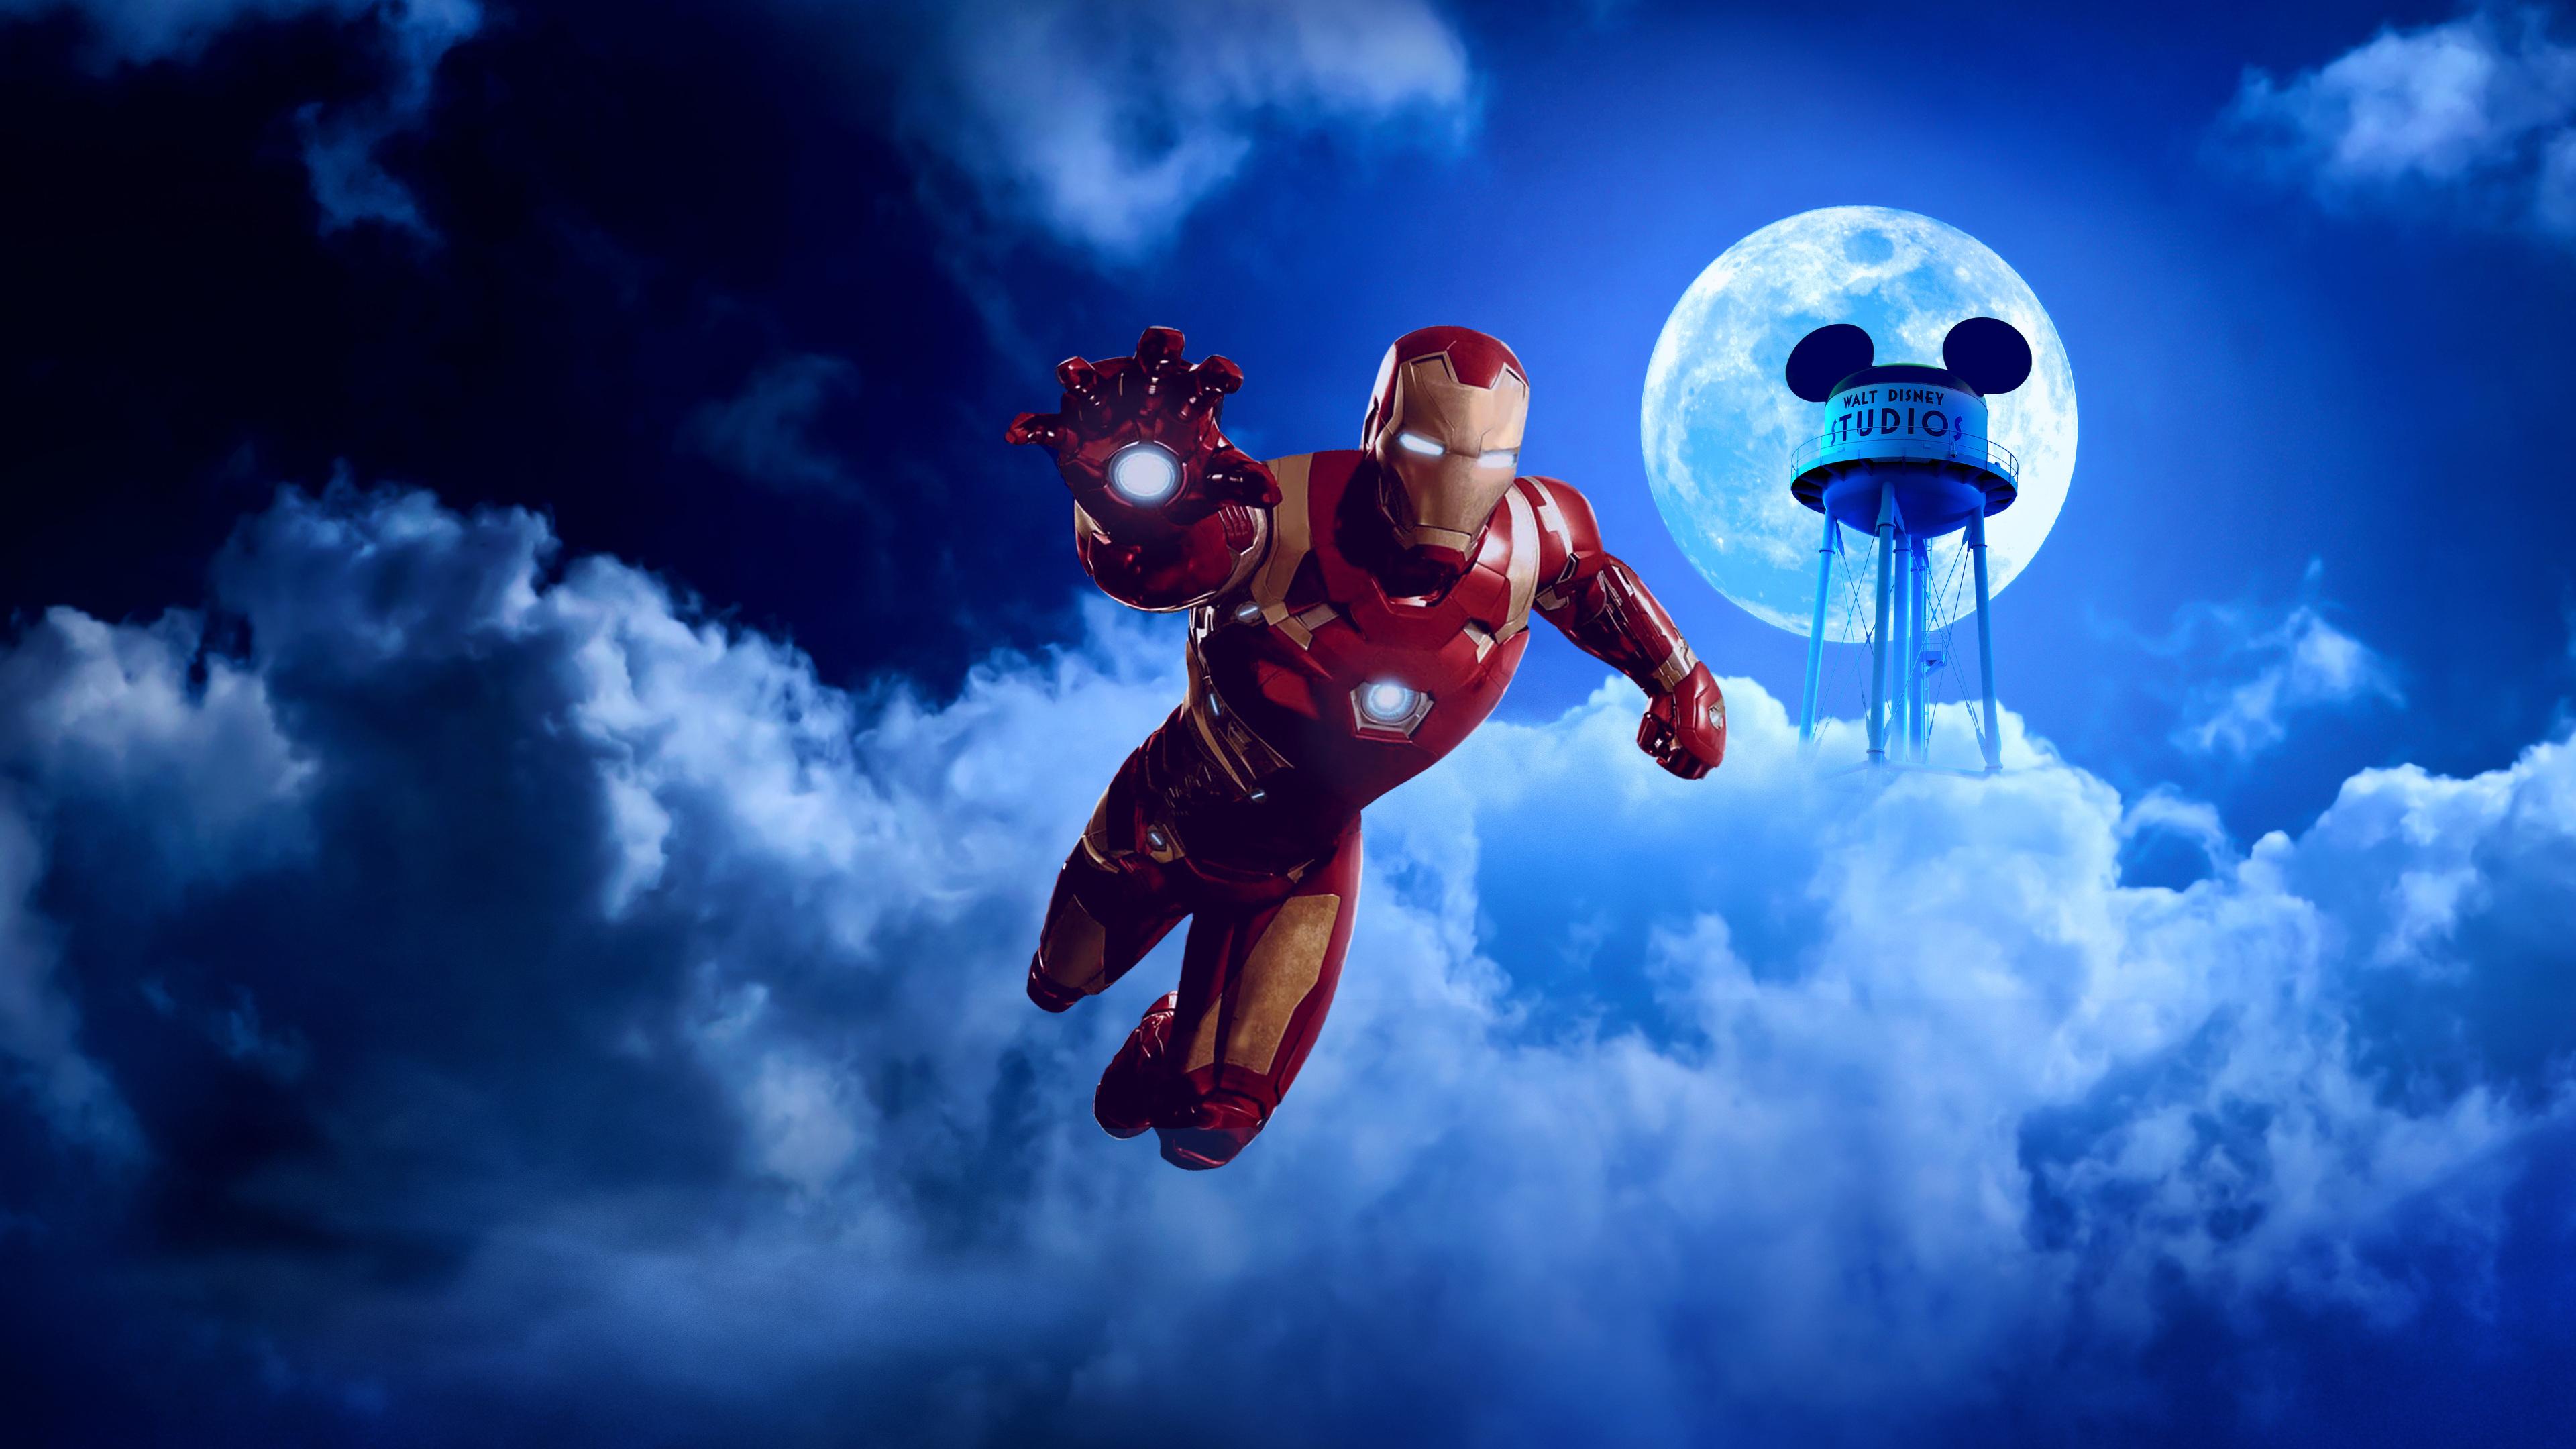 iron man marvel summer of super heroes disneyland paris 10k 1536524114 - Iron Man Marvel Summer Of Super Heroes Disneyland Paris 10k - superheroes wallpapers, iron man wallpapers, hd-wallpapers, 8k wallpapers, 5k wallpapers, 4k-wallpapers, 10k wallpapers